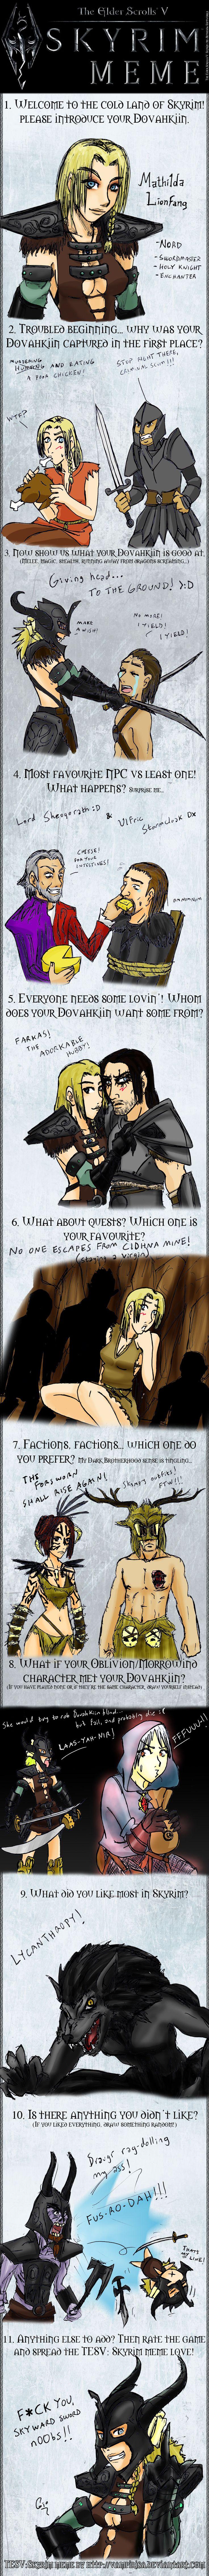 Skyrim Art Meme by makotomikami on DeviantArt